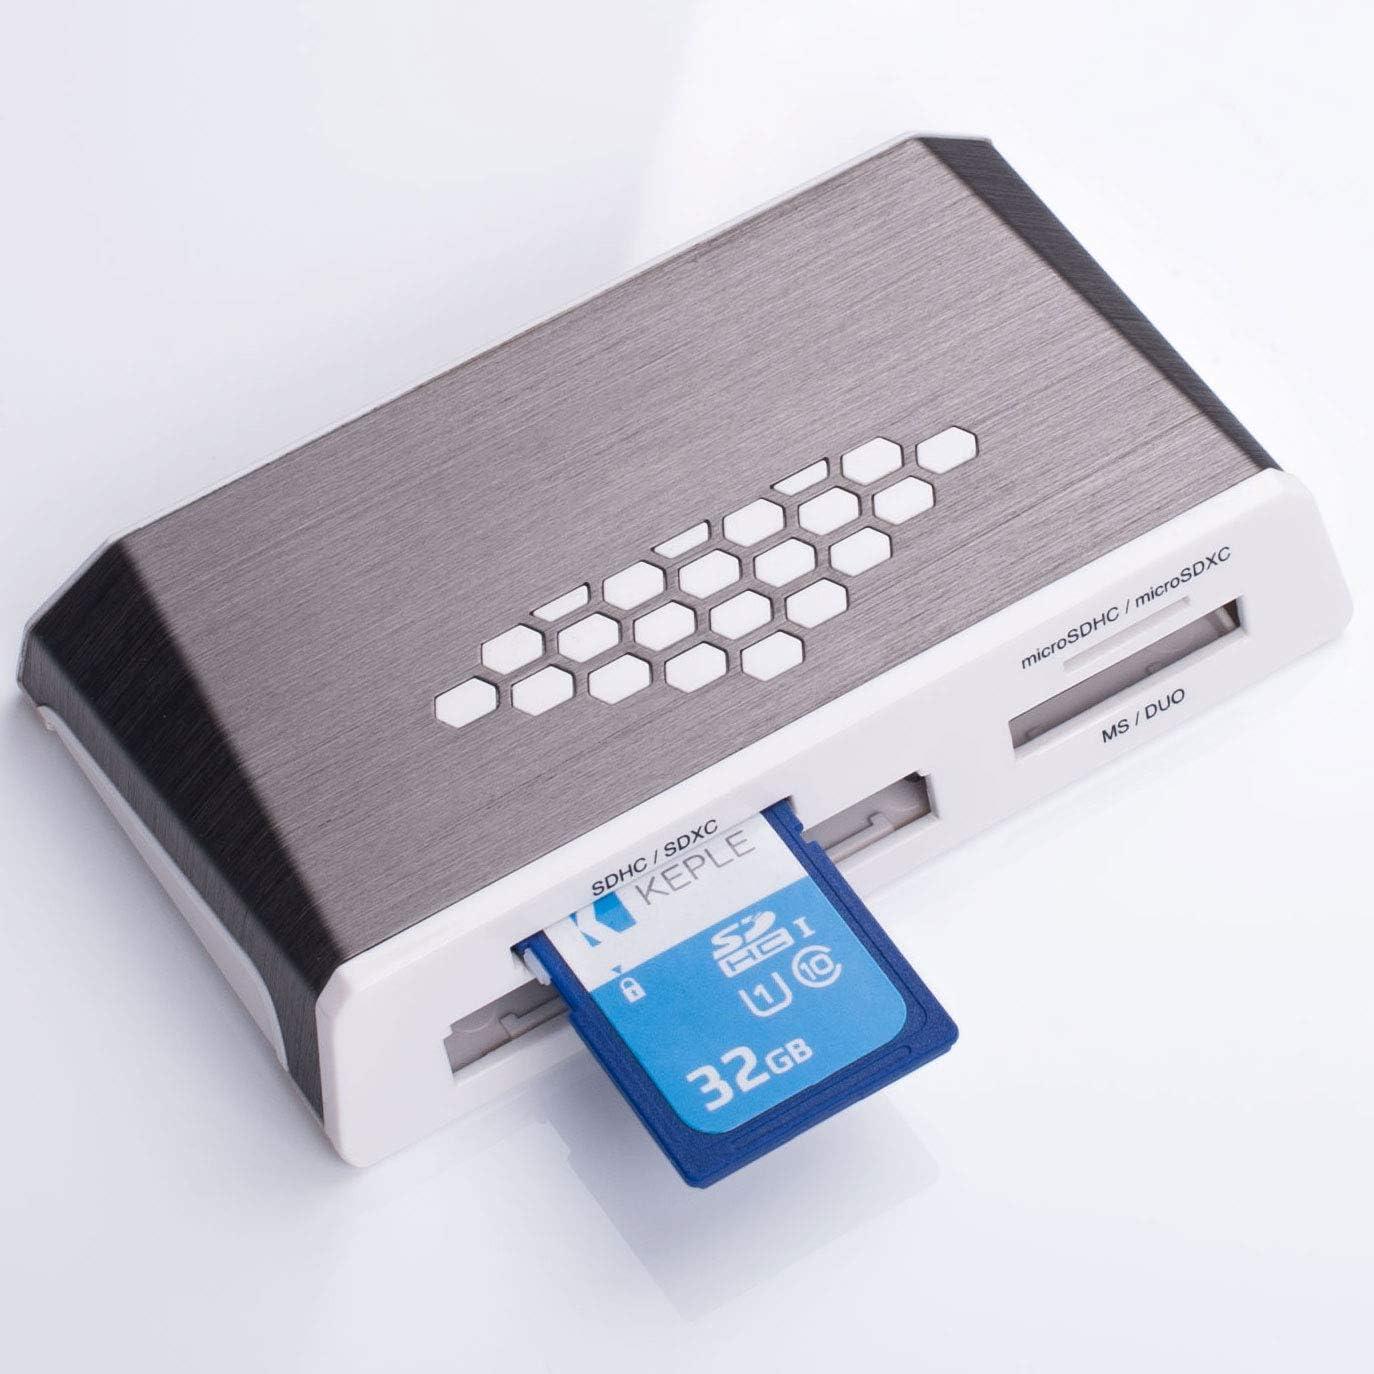 D5600 D7100 16GB SD Card Class 10 High Speed Memory Card for Nikon D3100 D850 D810 D5500 D5300 D810A Digital Camera D750 D3400 D7200 D610 D7500 D5100 UHS-1 U1 SDHC 16 GB D3300